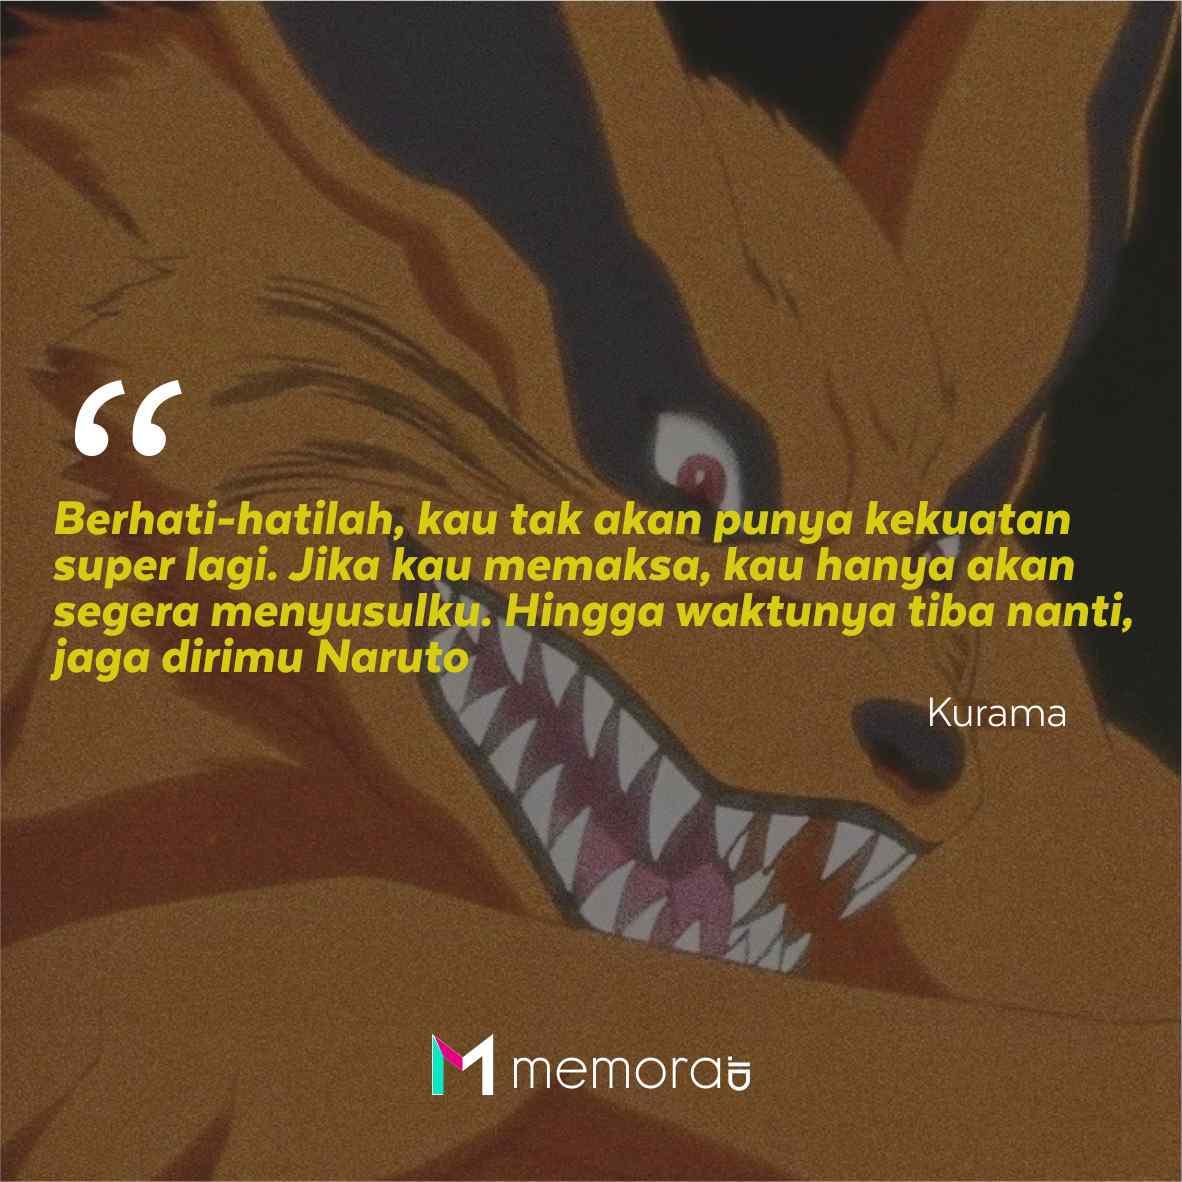 Kata-Kata Mutiara Kurama Berikut Kata-Kata Mutiara Kurama: